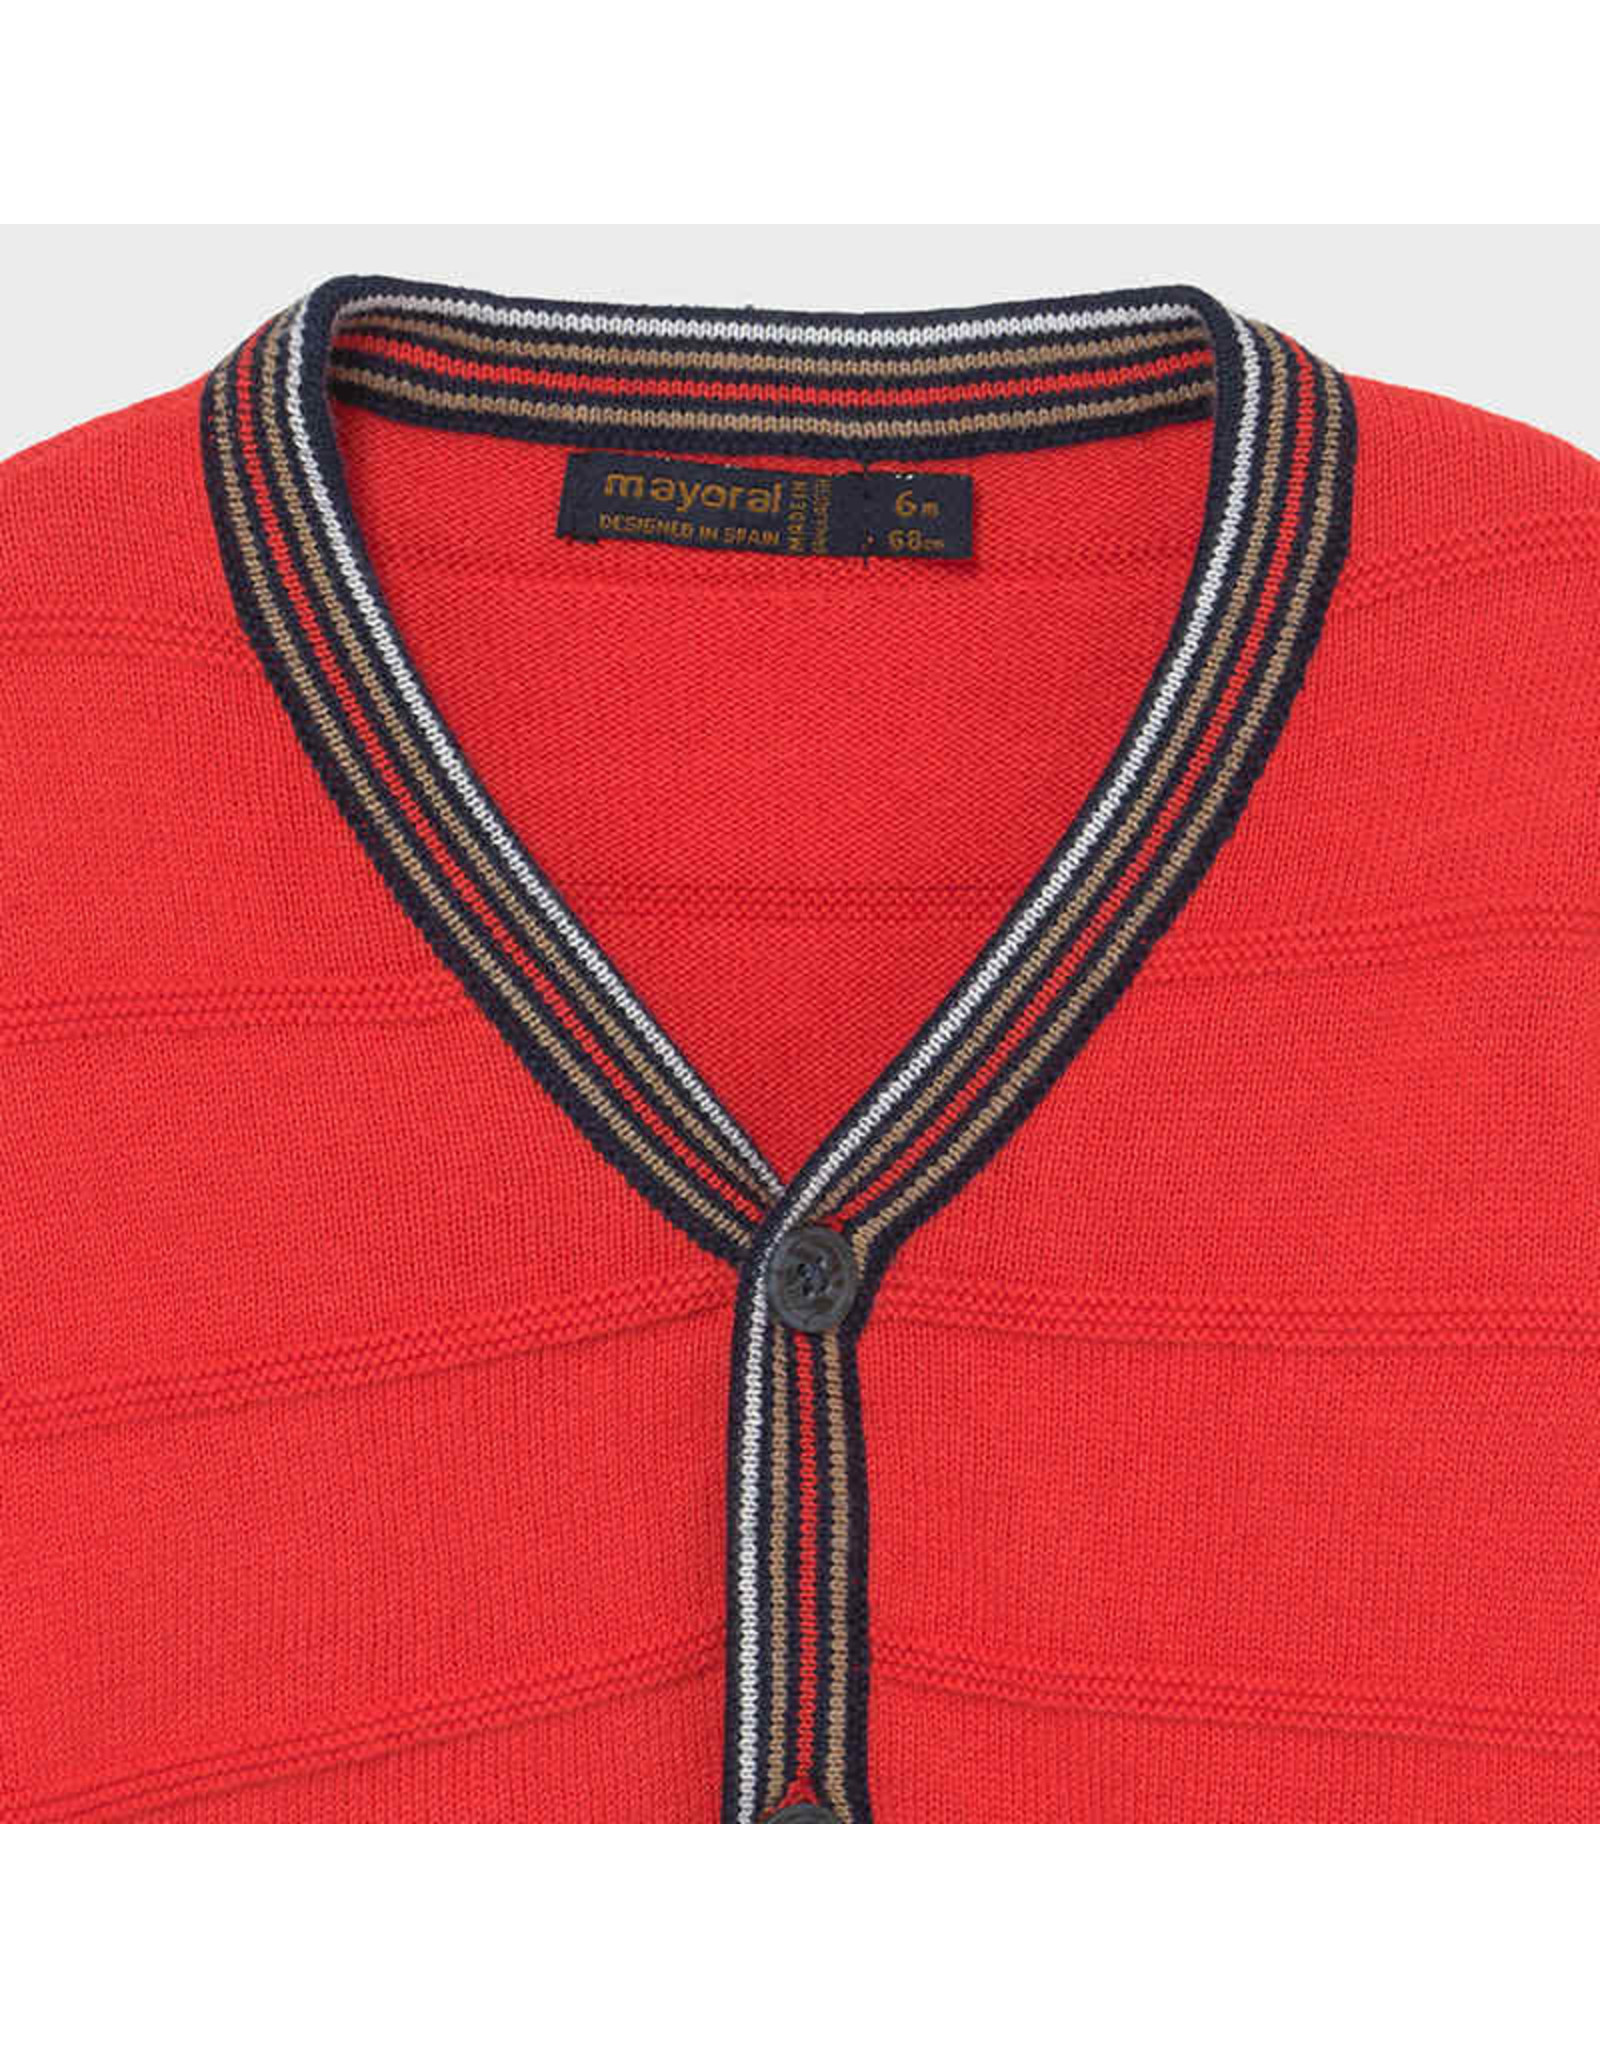 Mayoral Knitted dressy cardigan